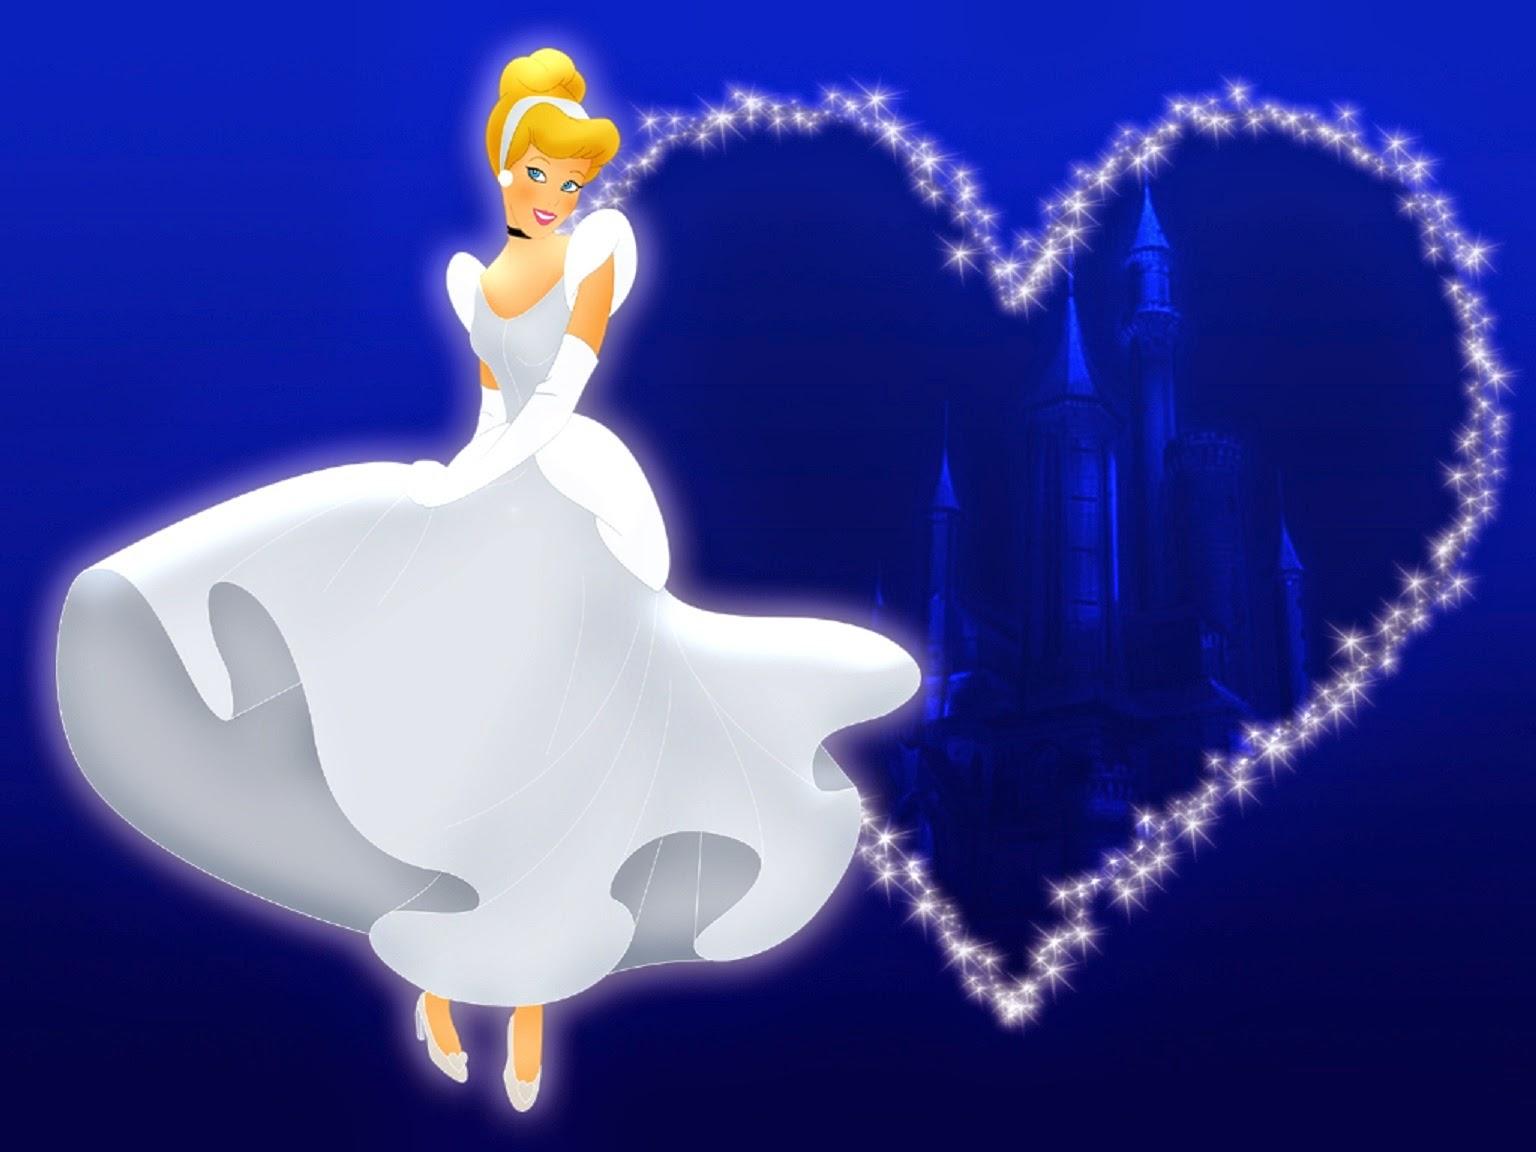 Cinderella Full Hd Image Wallpaper For Galaxy Note Cartoons 1536x1152